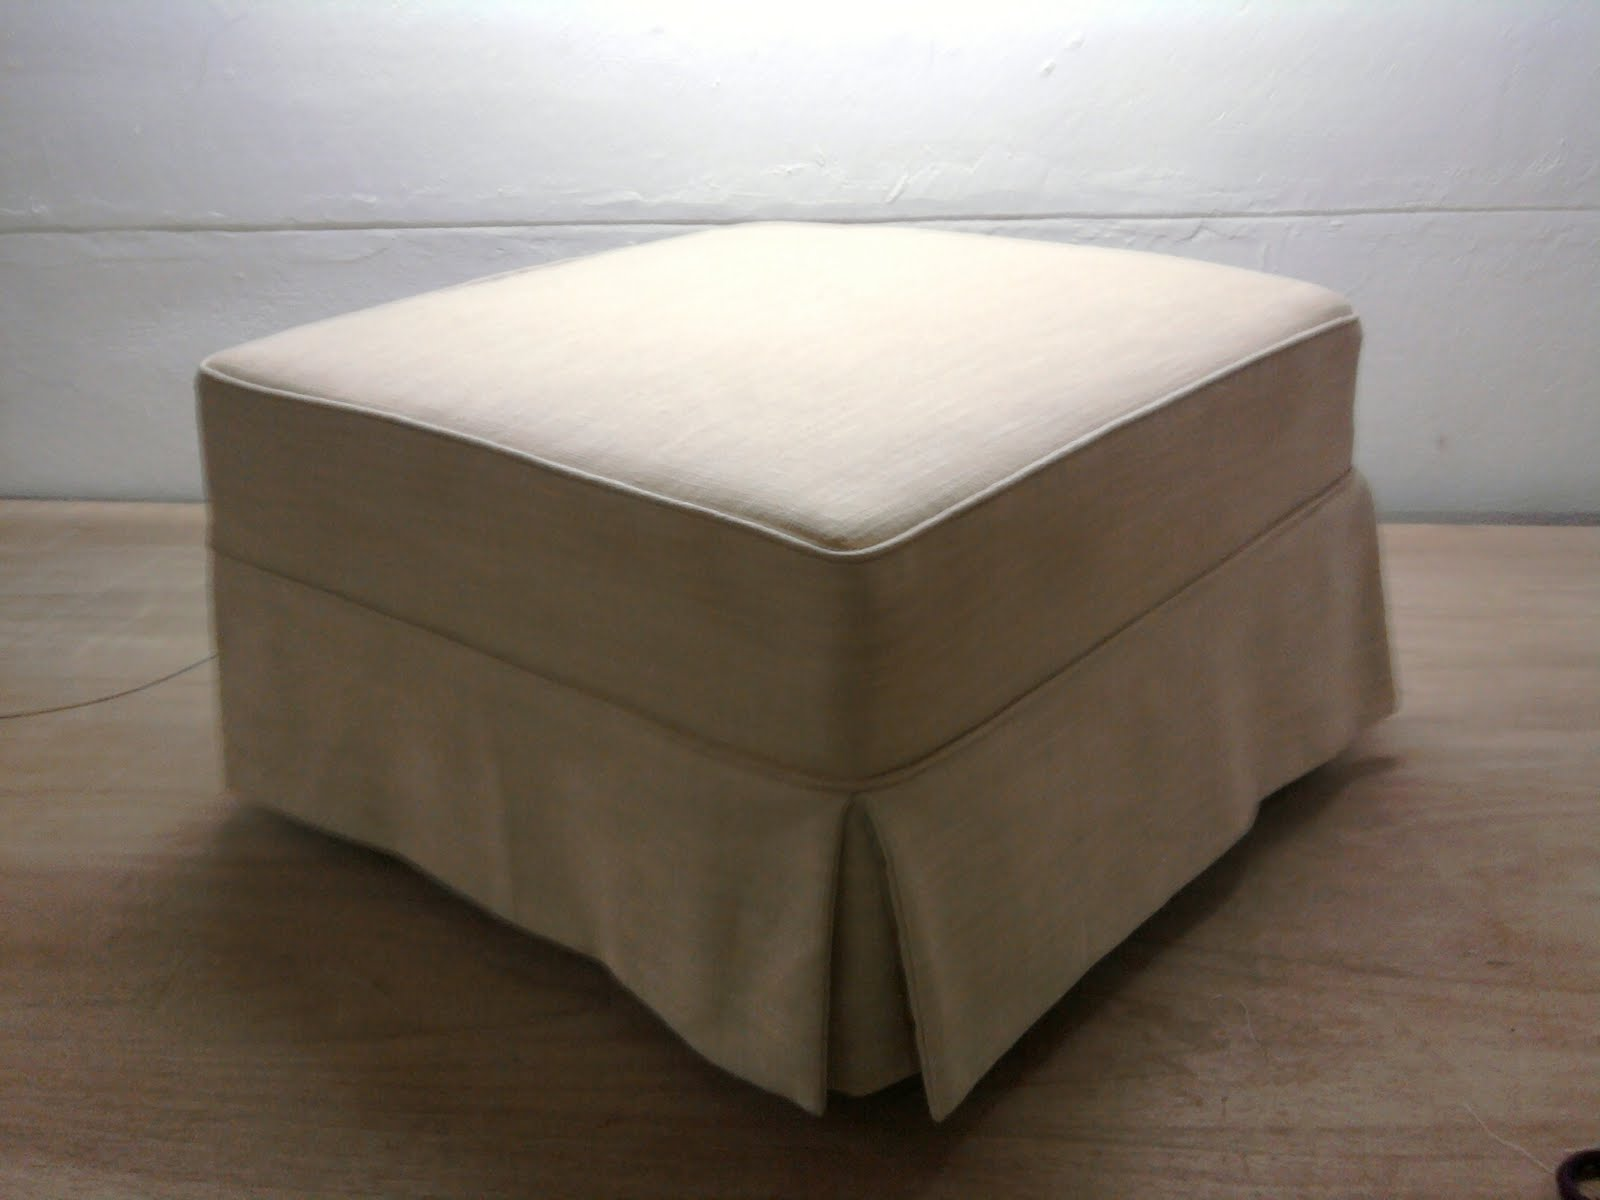 semi circle sofa for bay window klippan two seat kia meng trading products and services